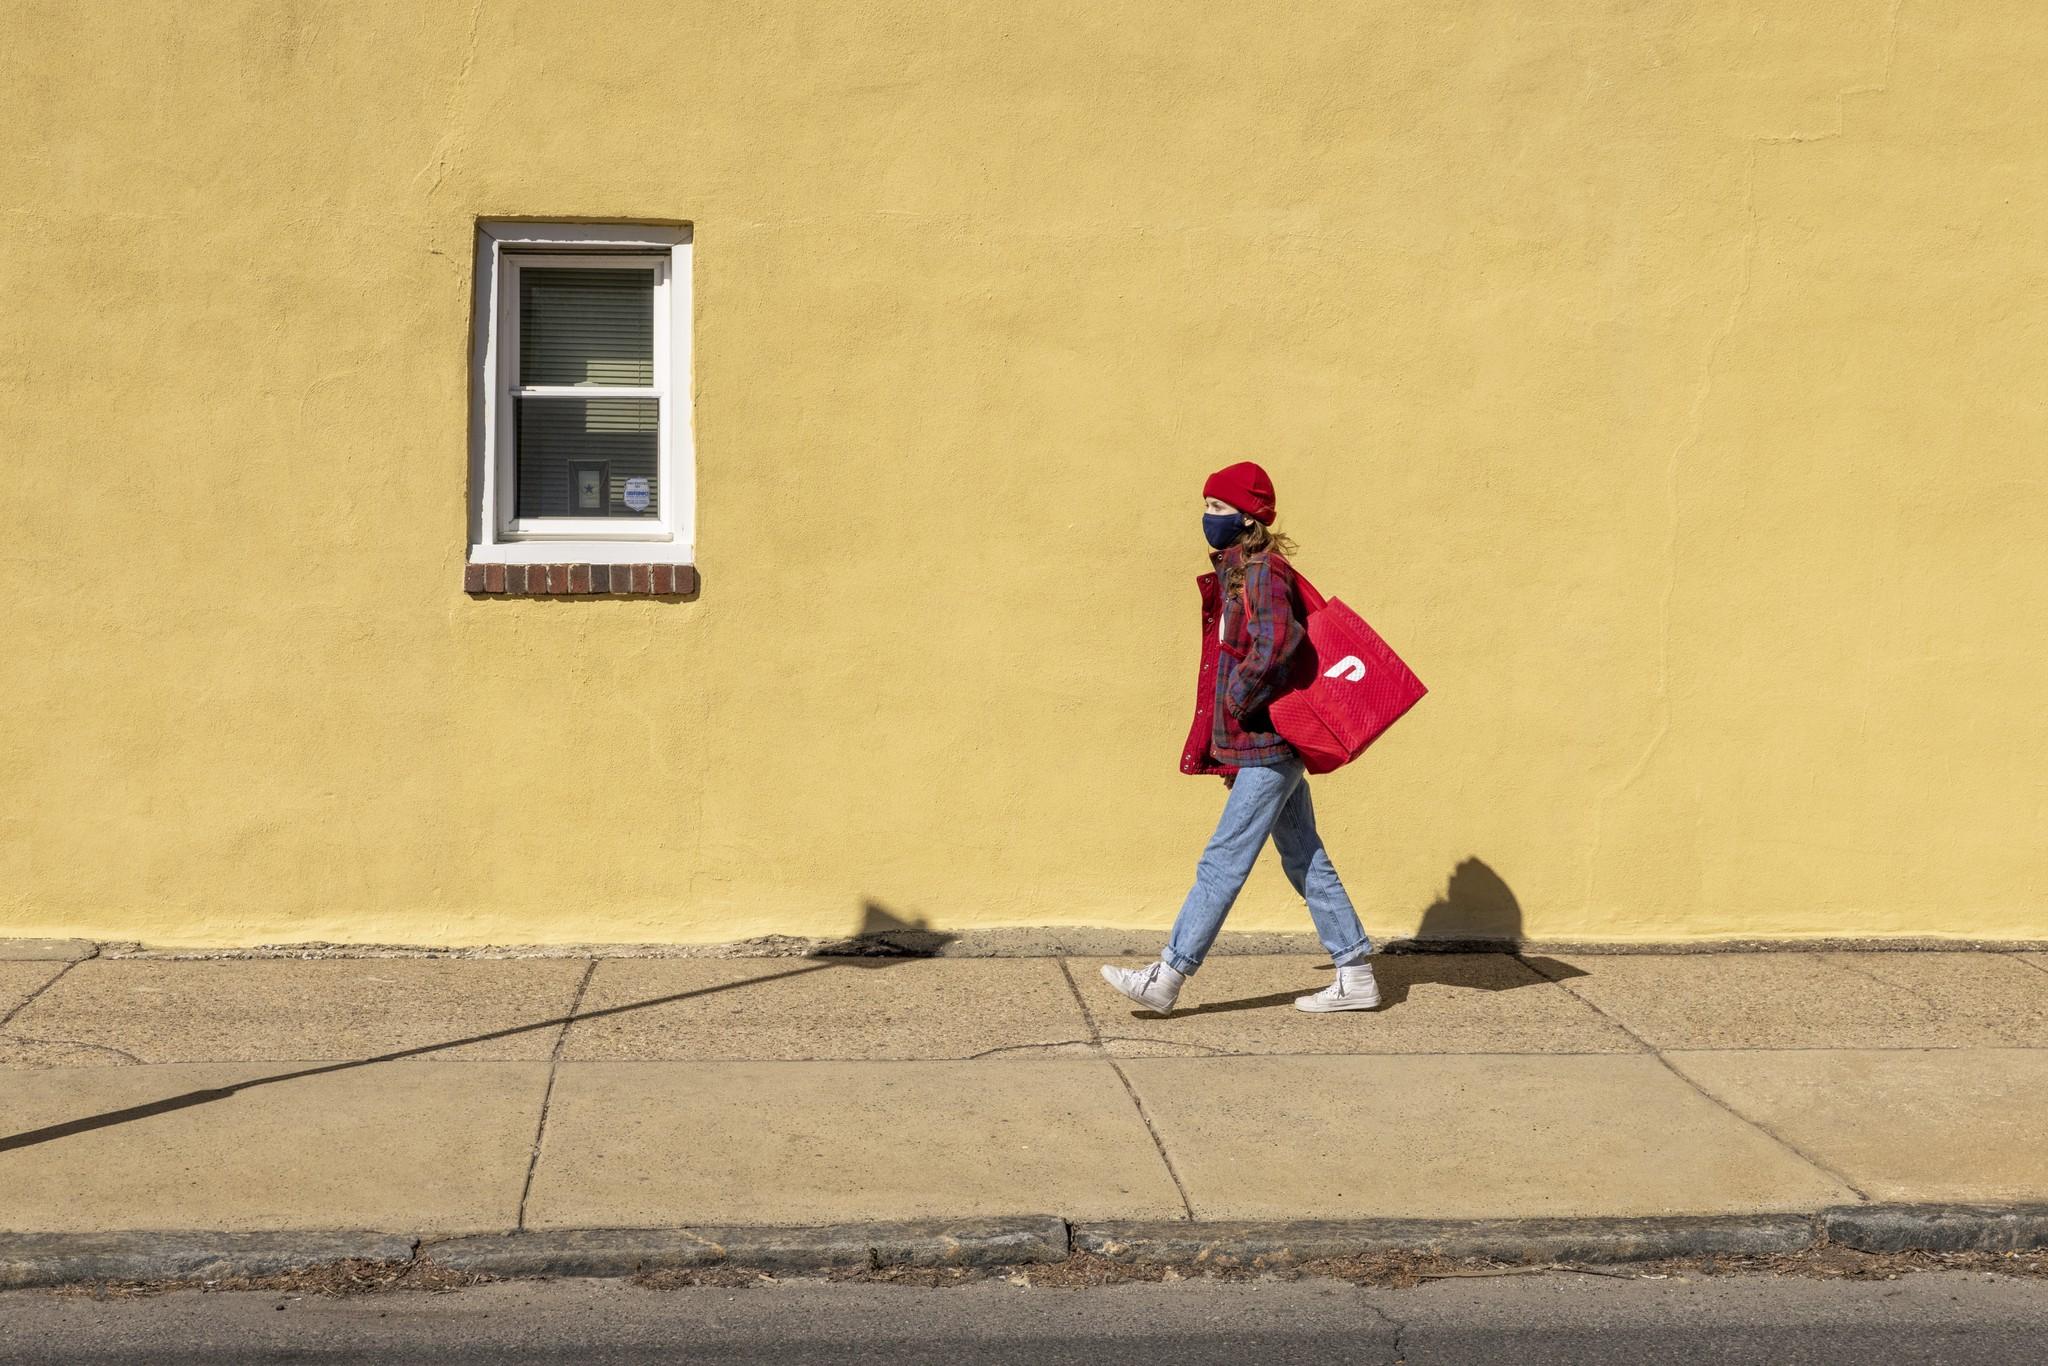 DoorDash快递员在走路